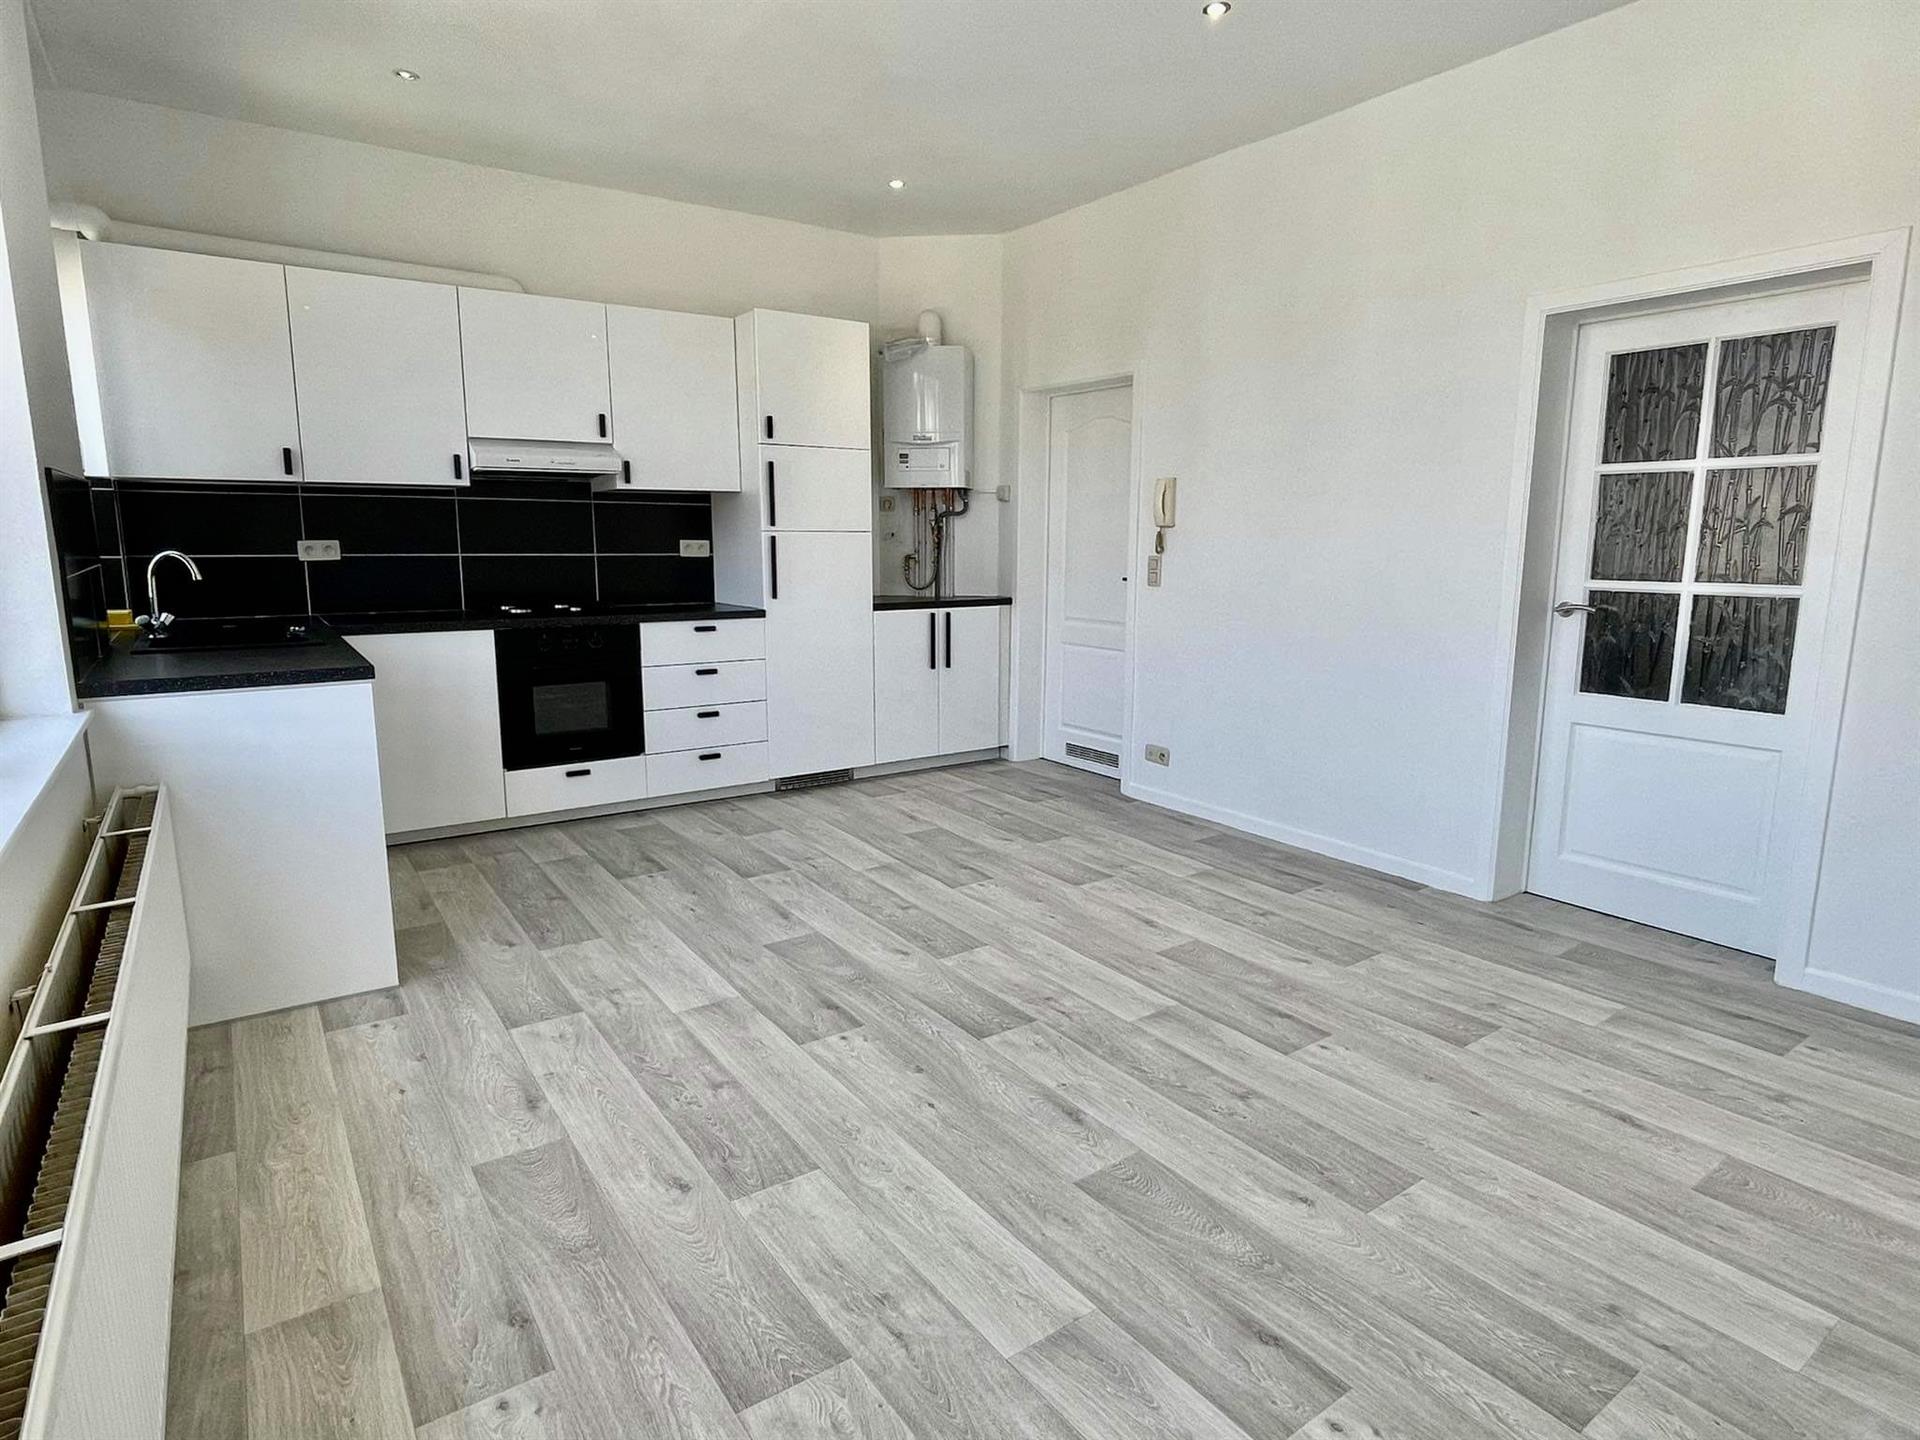 Appartement - Molenbeek-Saint-Jean - #4343762-0